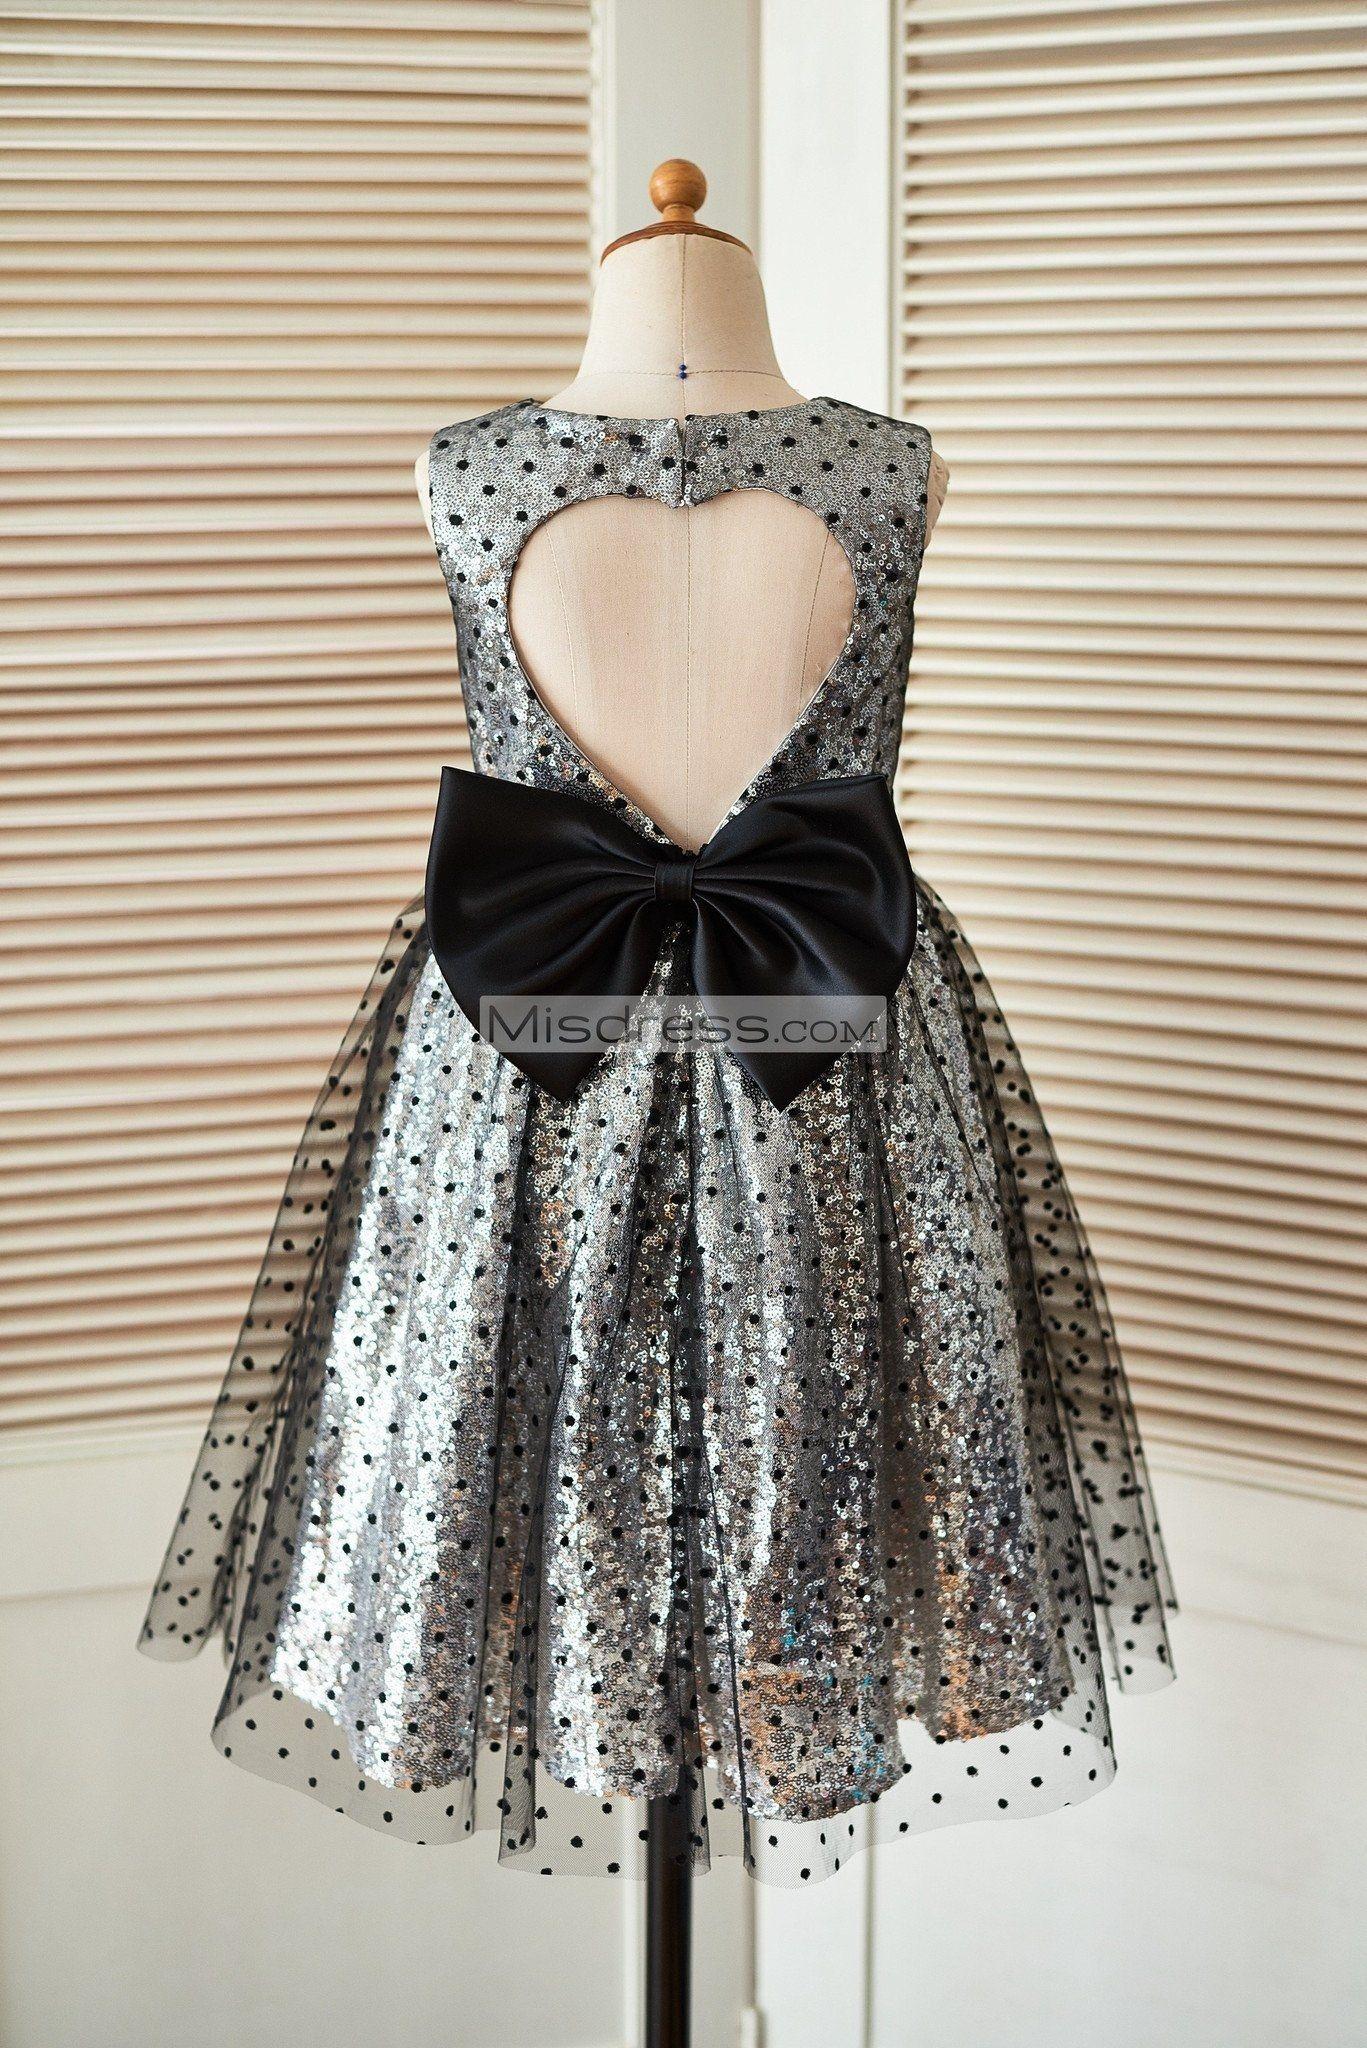 28244c810 Silver Sequin Black Polka Dot Tulle Wedding Flower Girl Dress with Keyhole  Back SKU: K1003404 Buy Now: #flowergirldress #wedding #tulleskirt # ...